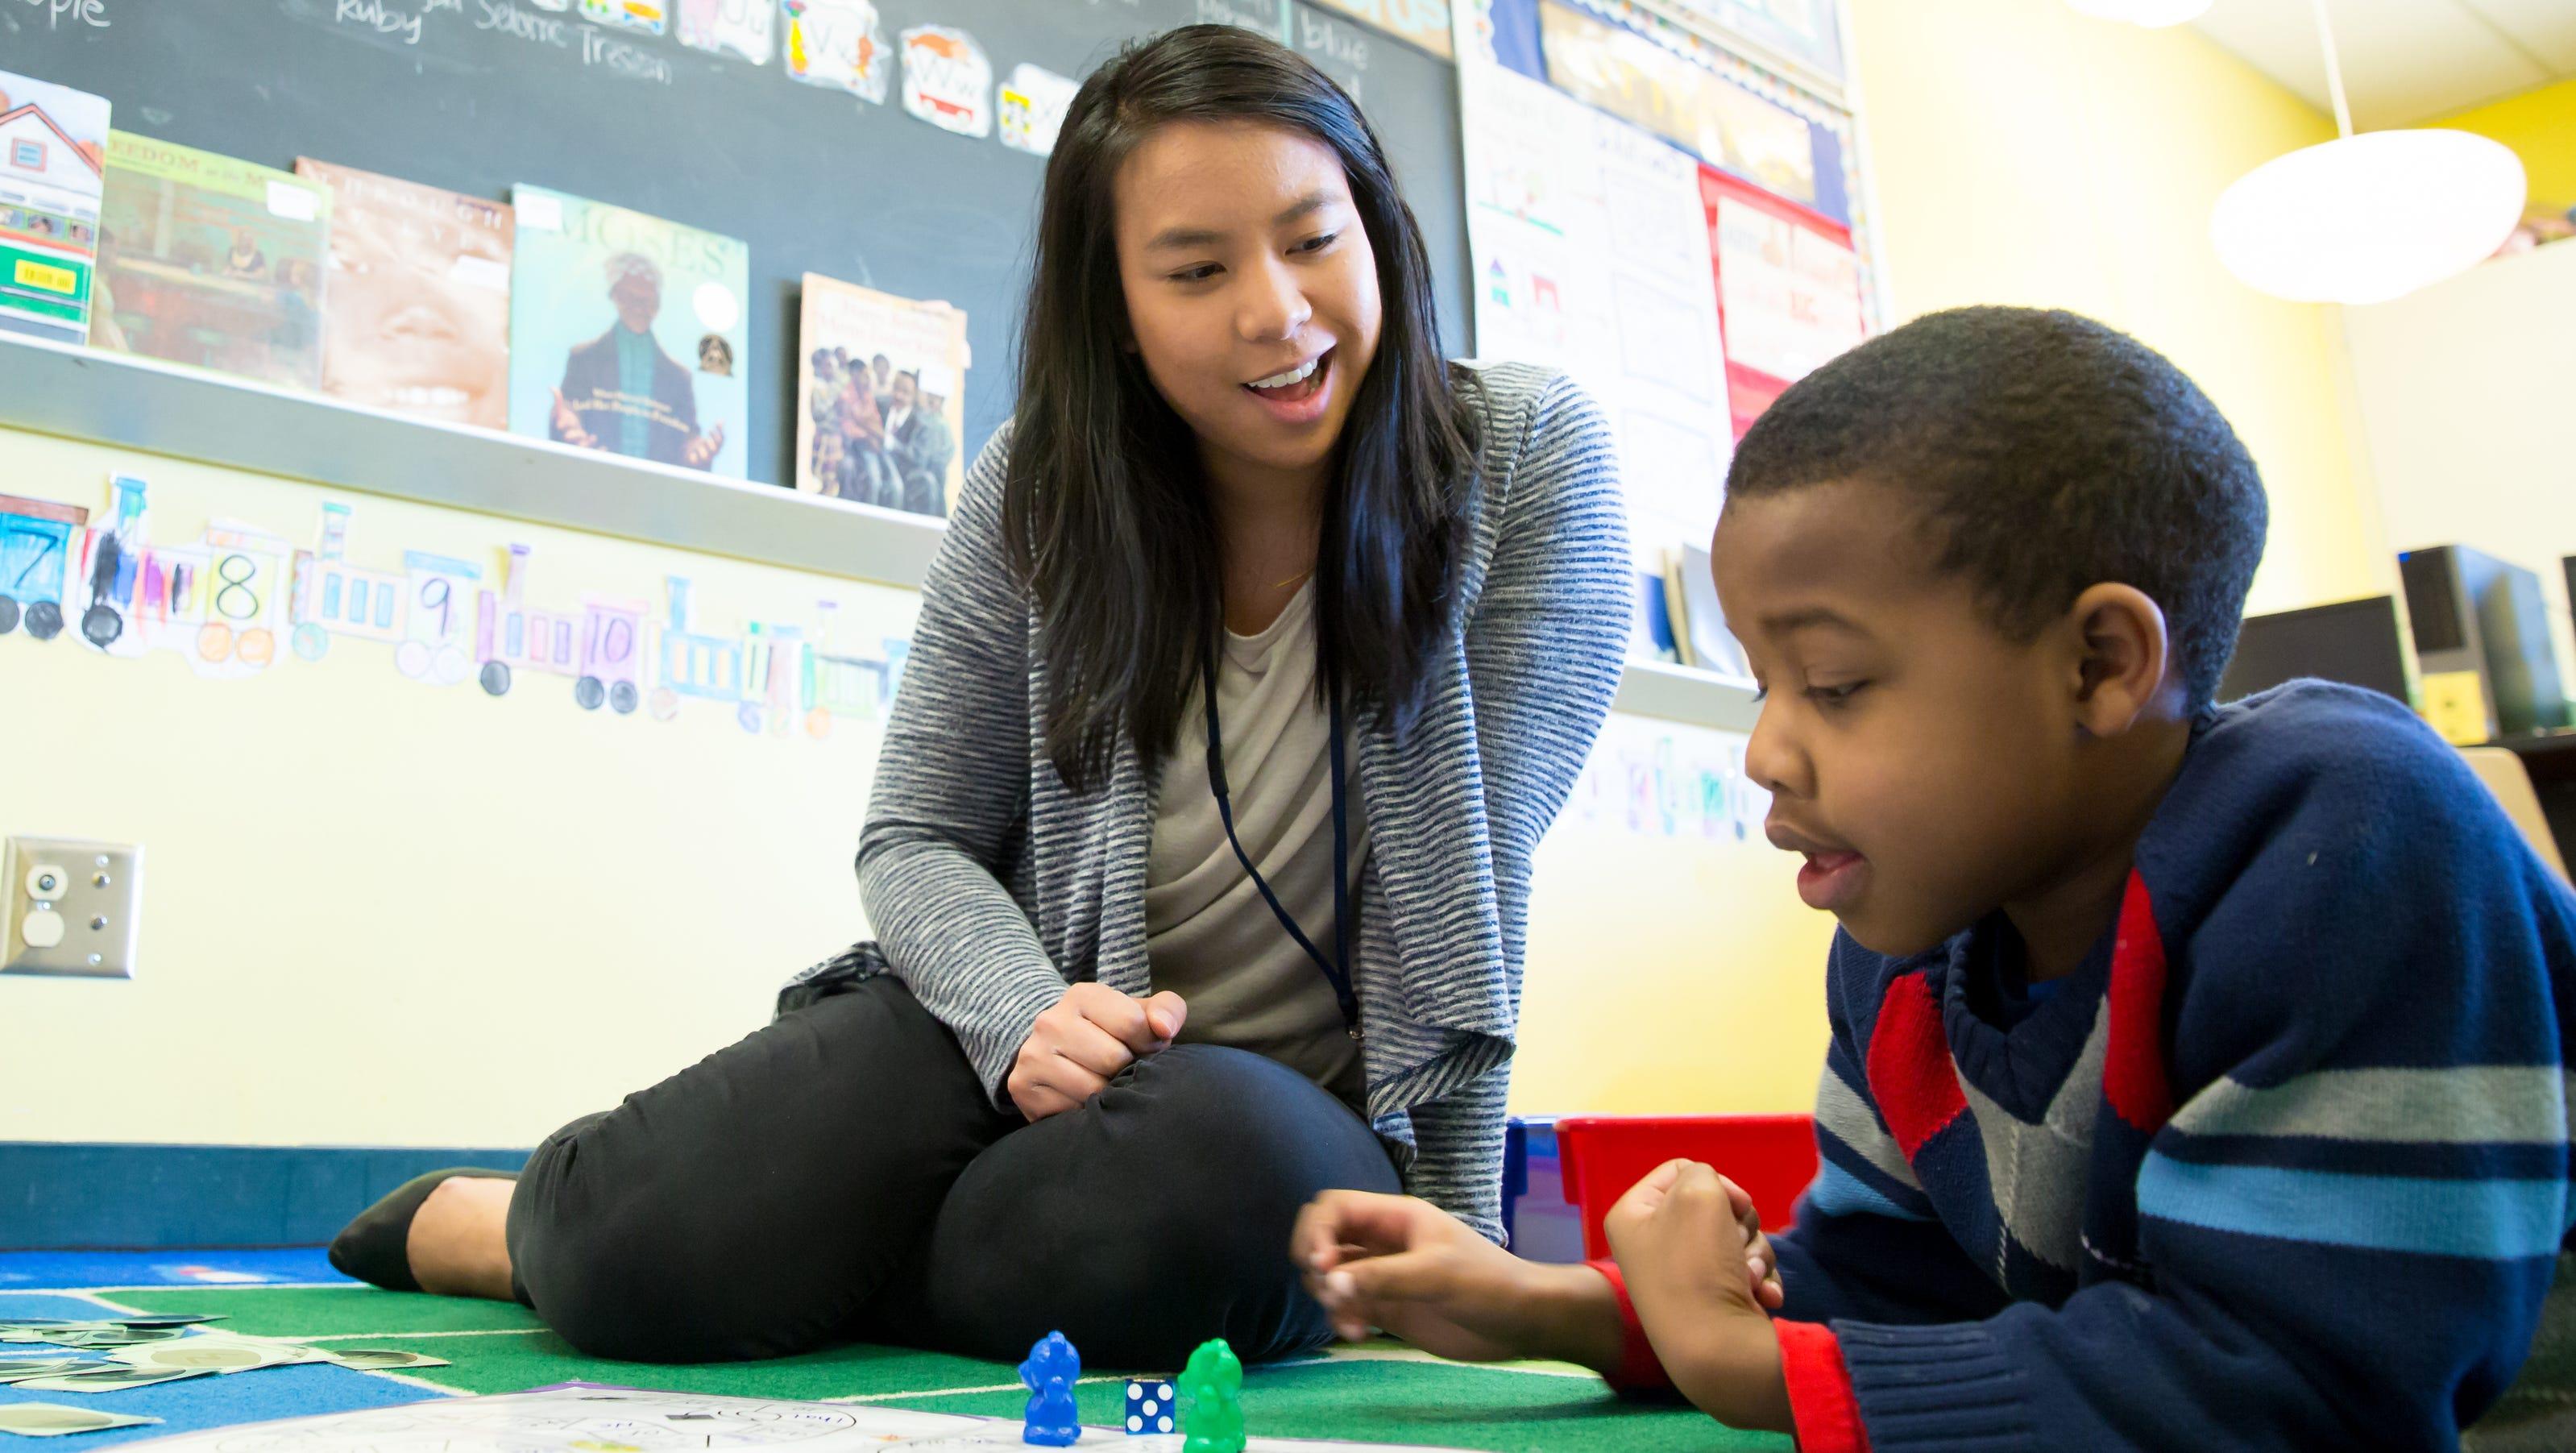 teachers dedicated learn teacher schools learning alongside mentors teaching aspiring she usatoday working